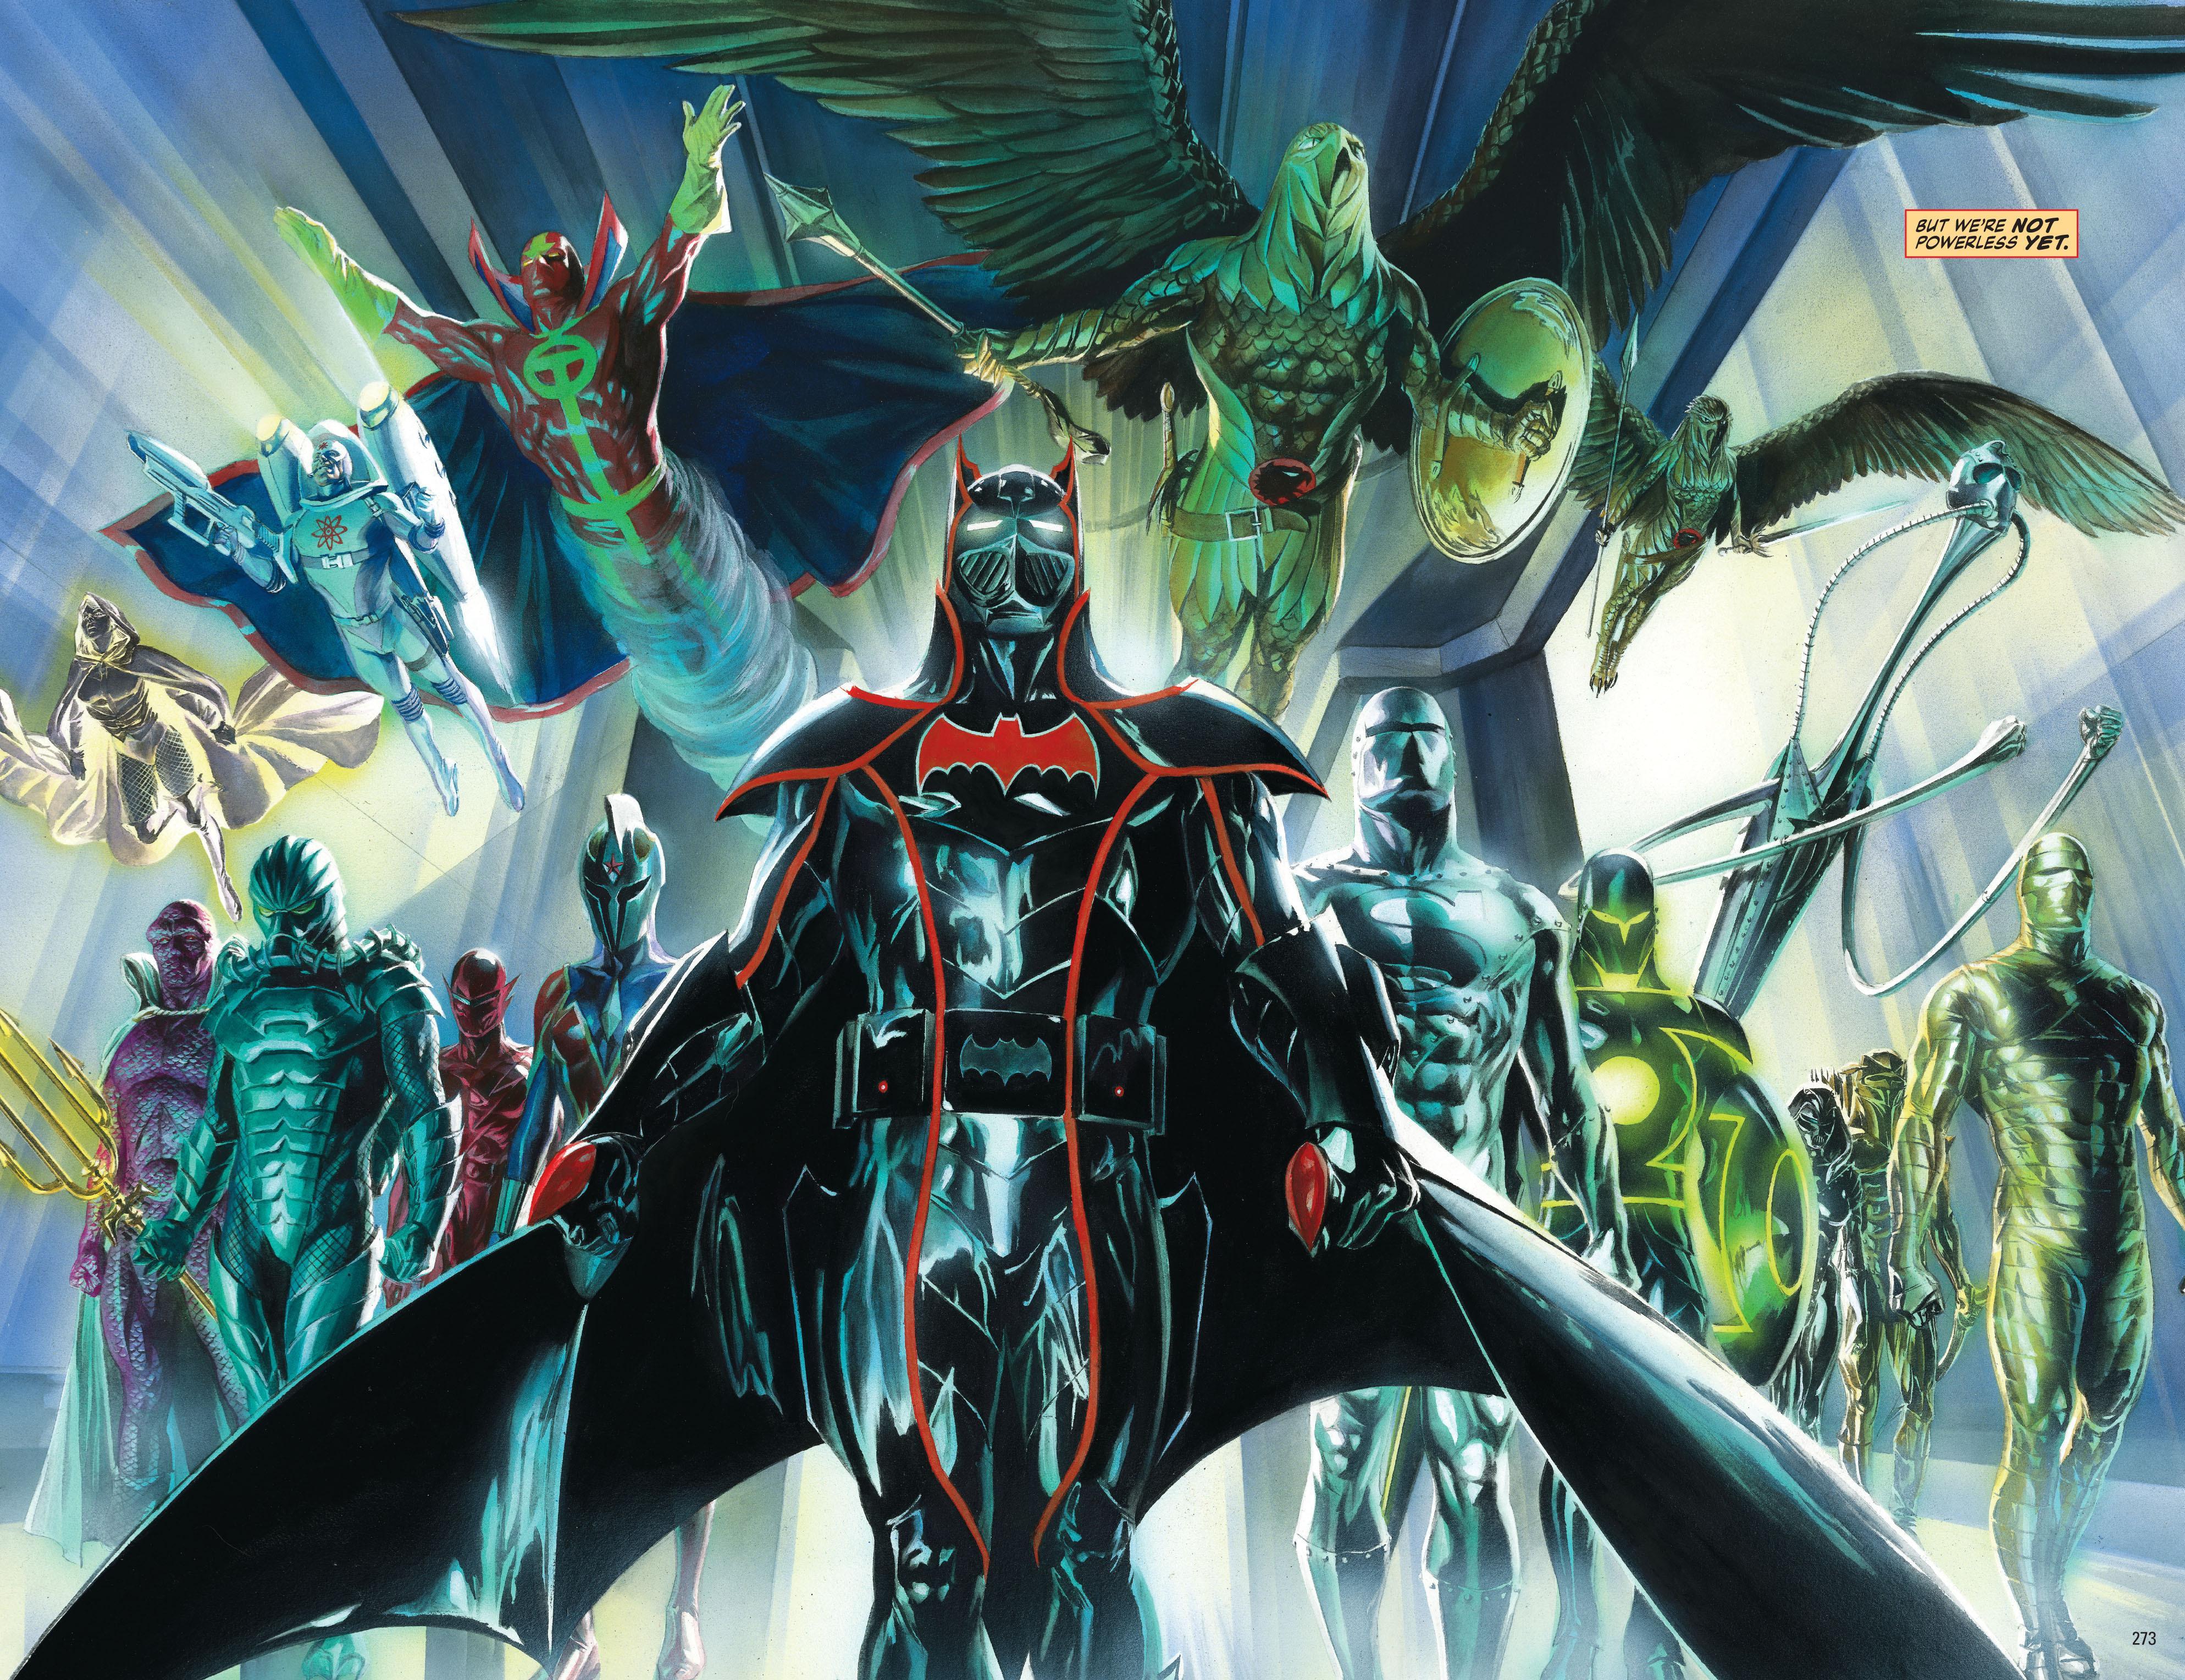 Justice Alex Ross Vol 3 review